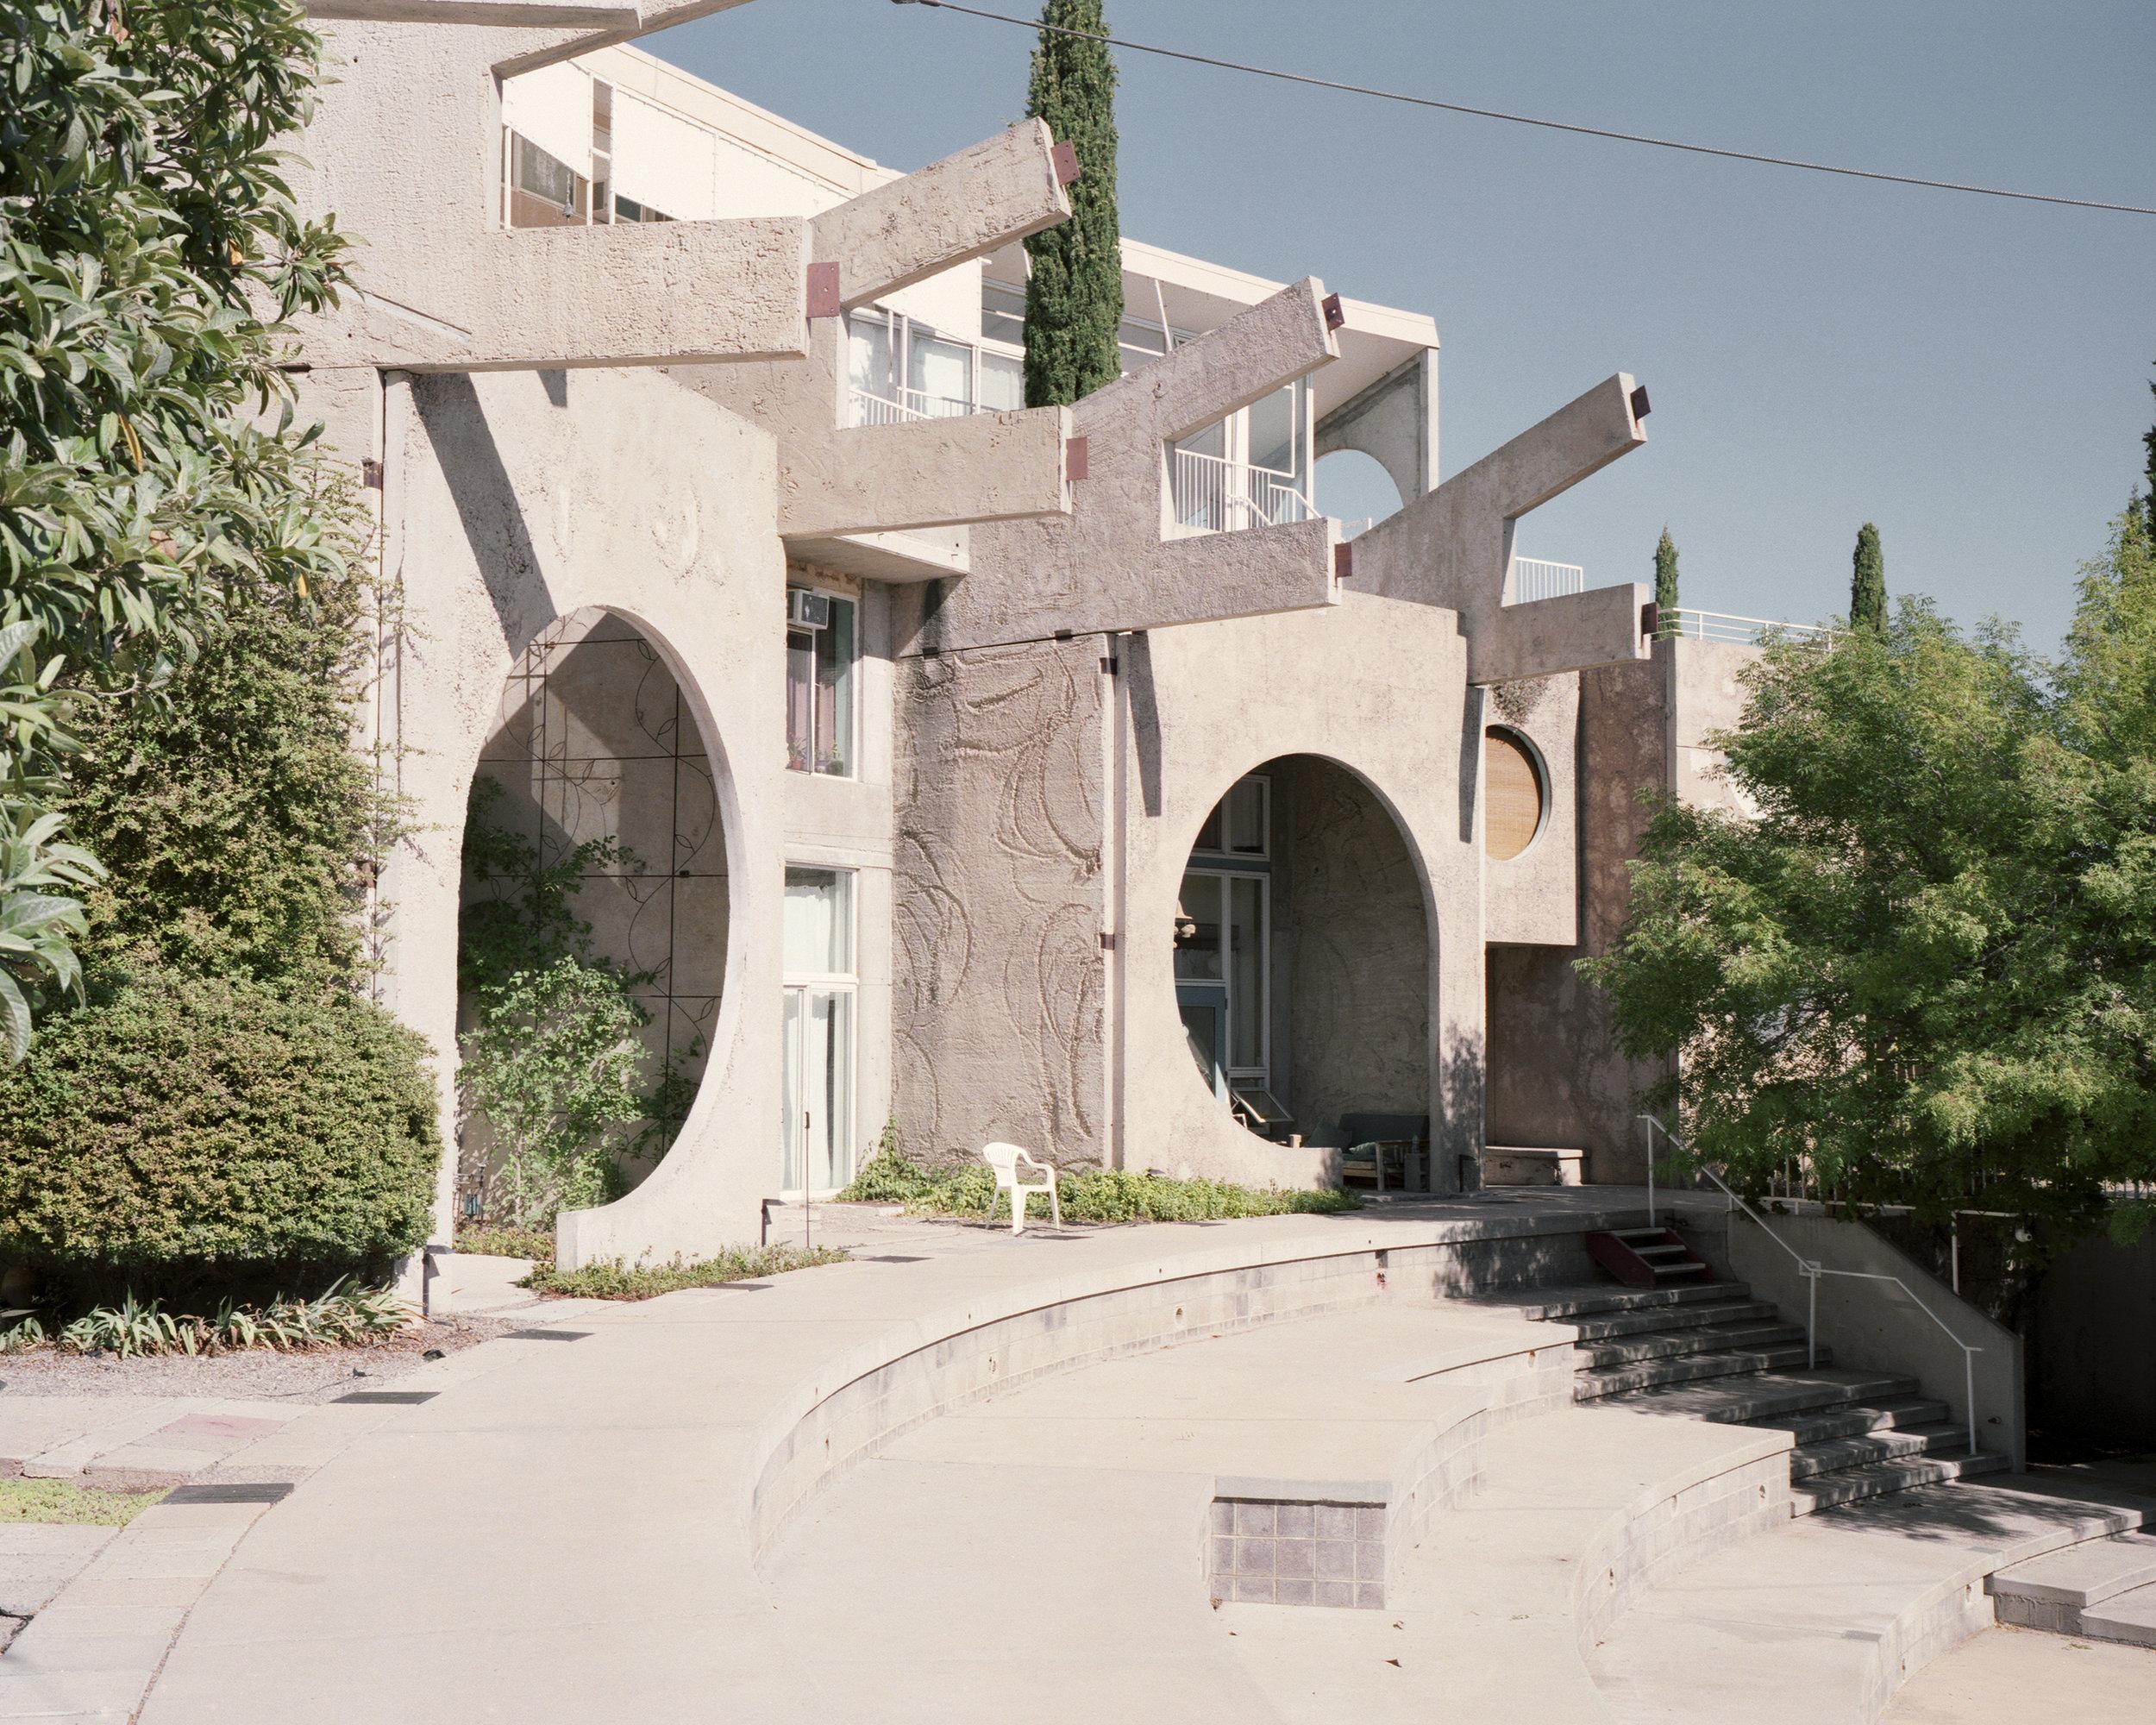 archaic_AlbertoSinigaglia_Arcosanti11.jpg